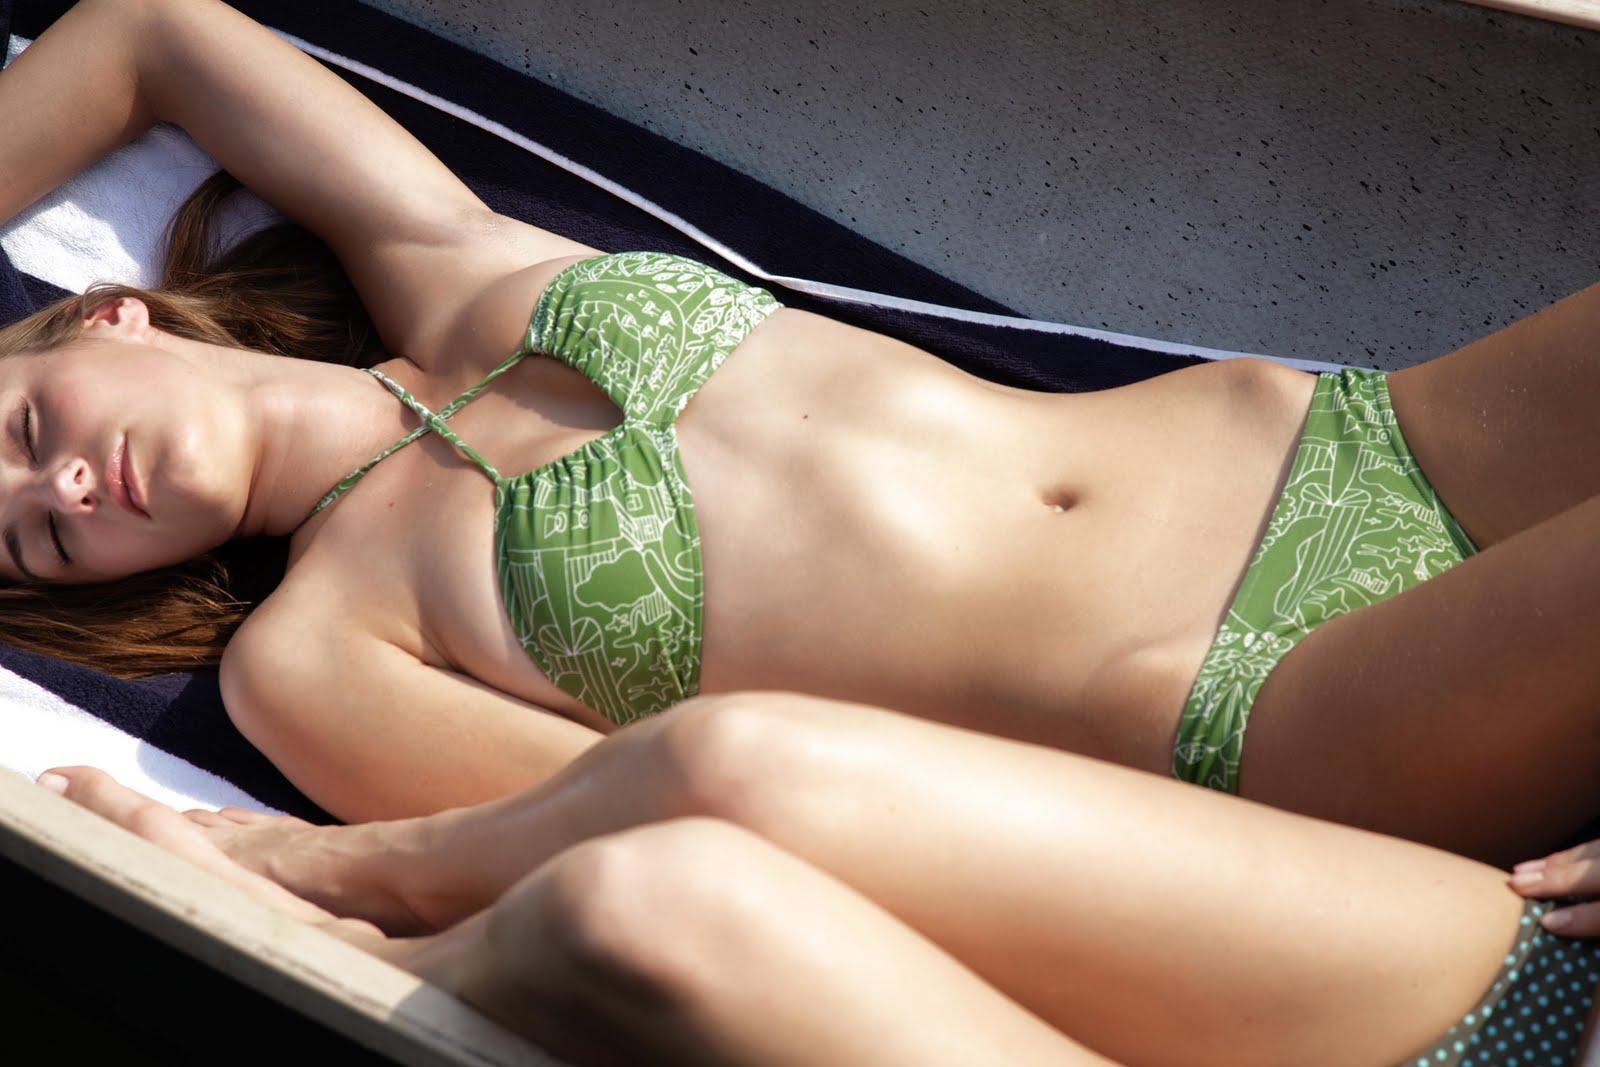 Ass Celebrity Mariya Tabak naked photo 2017